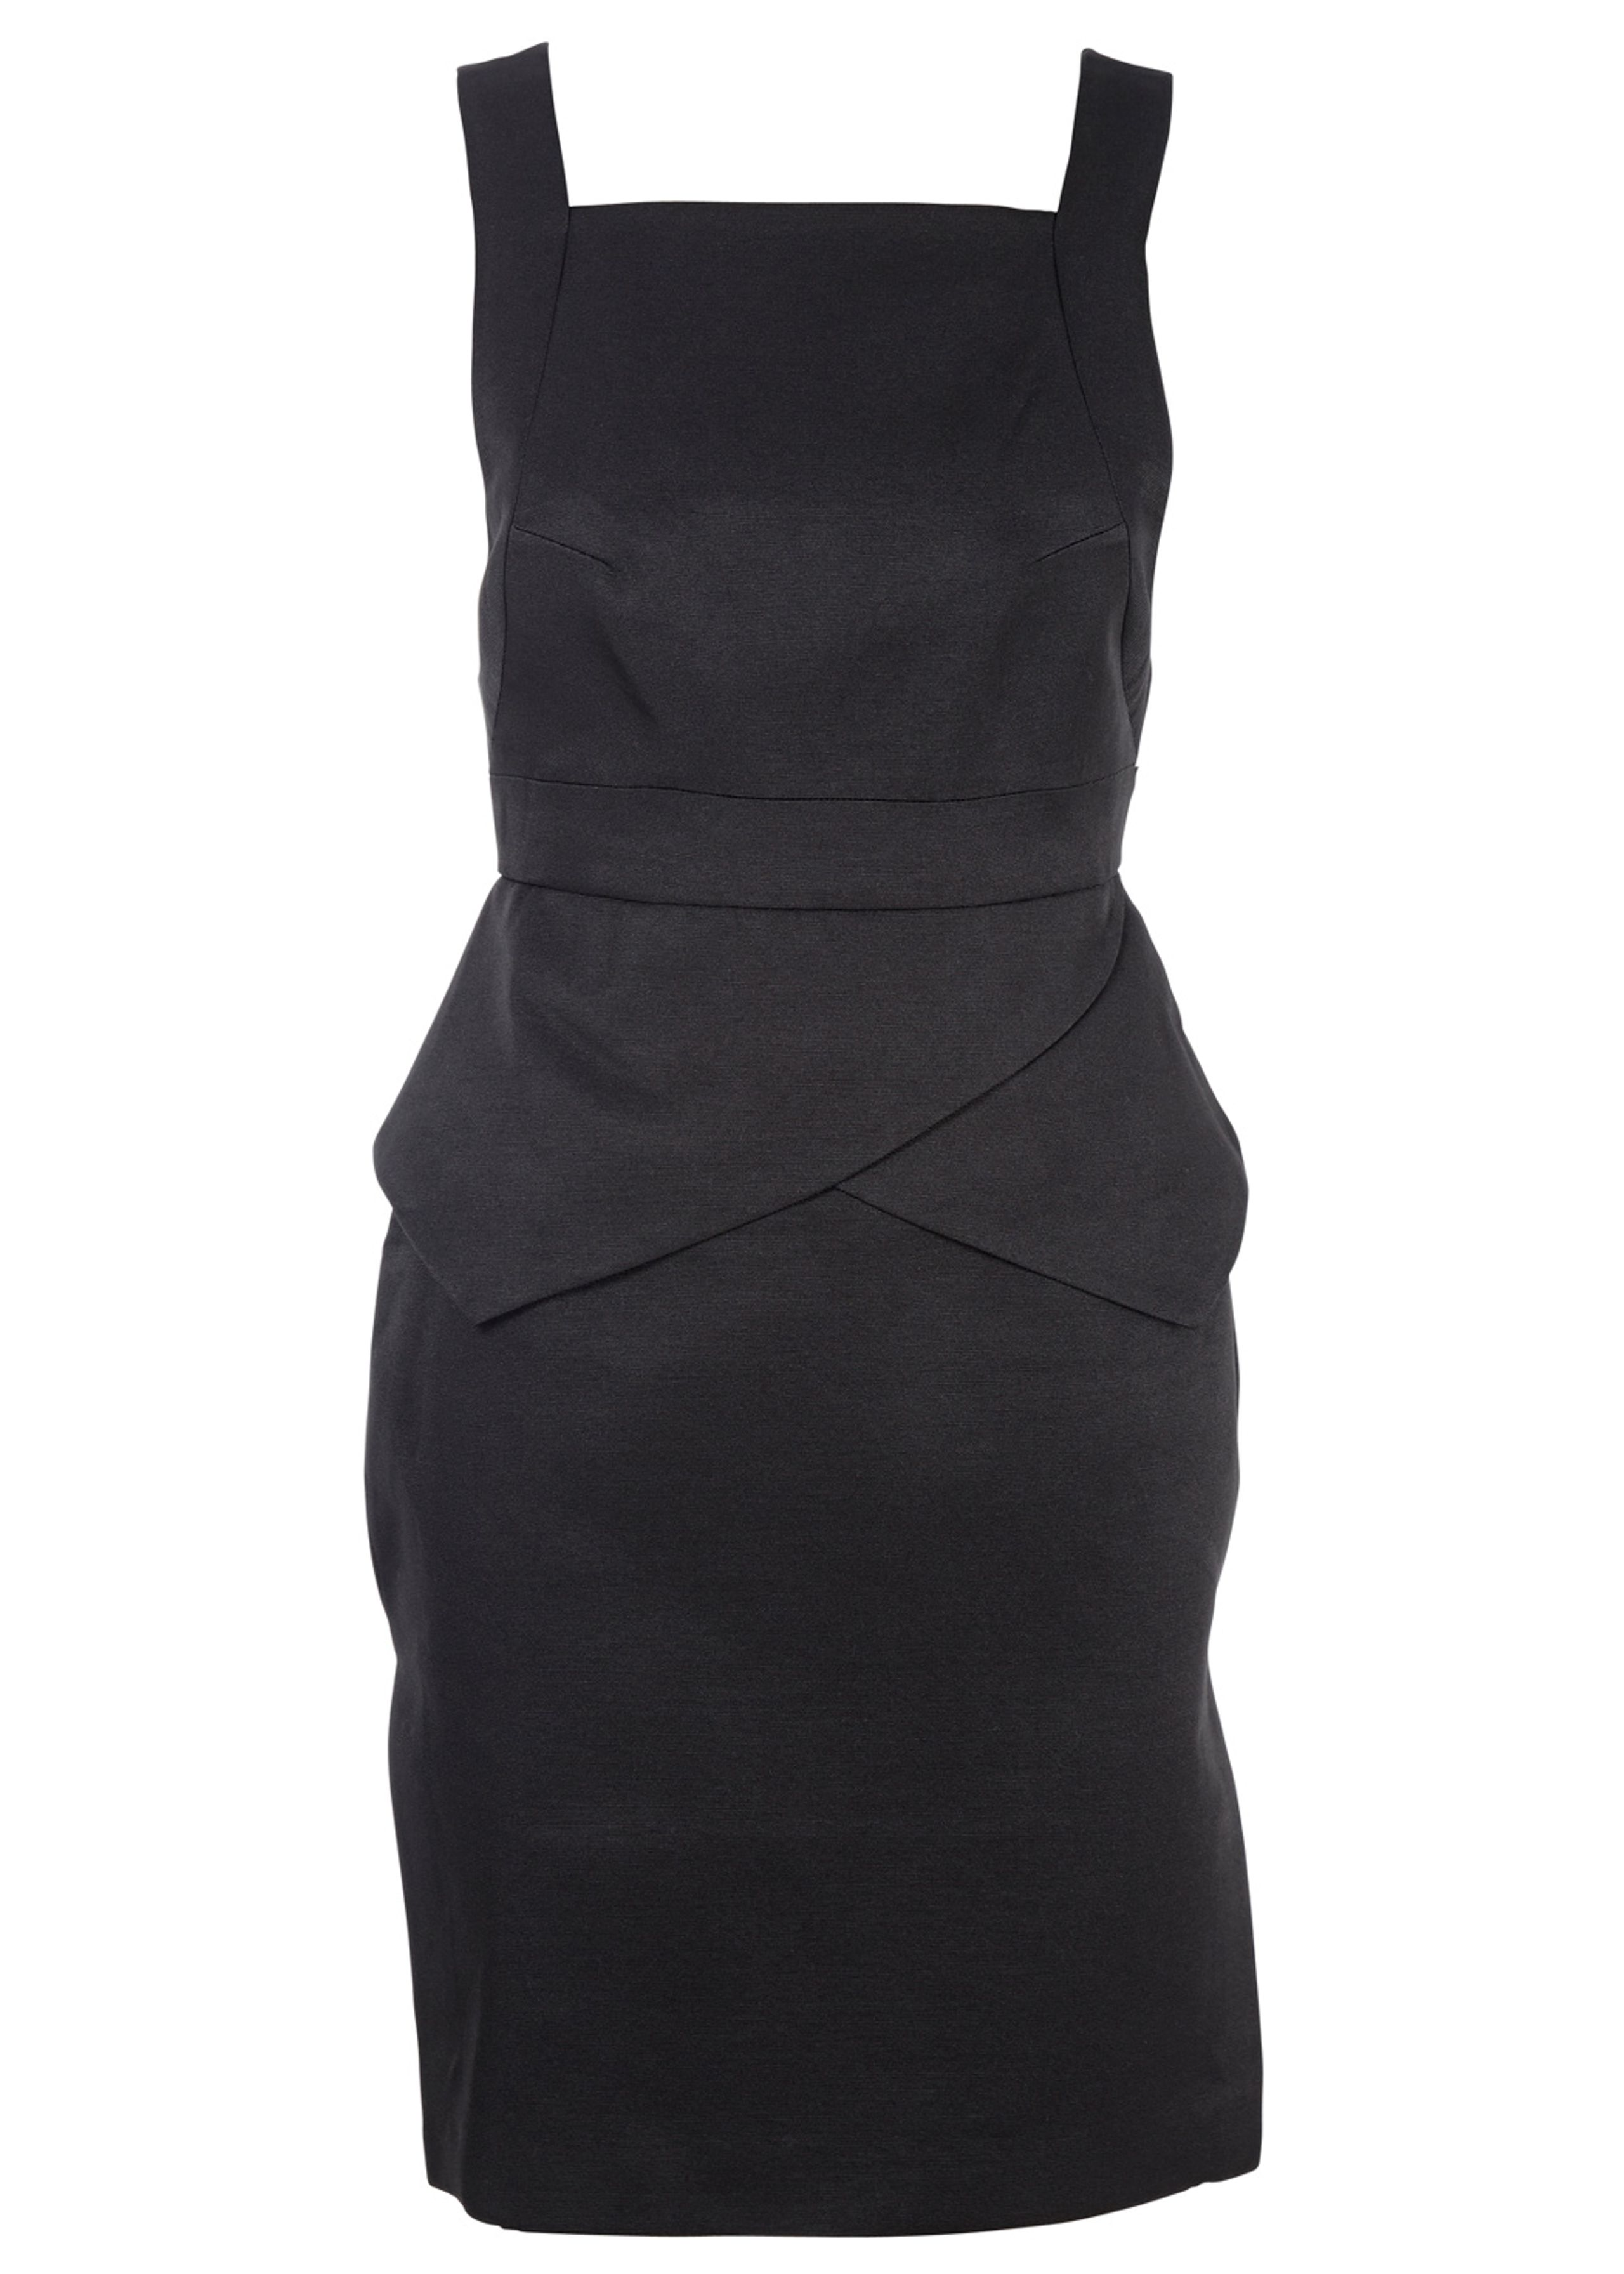 Image of   Tight Highrider Dress